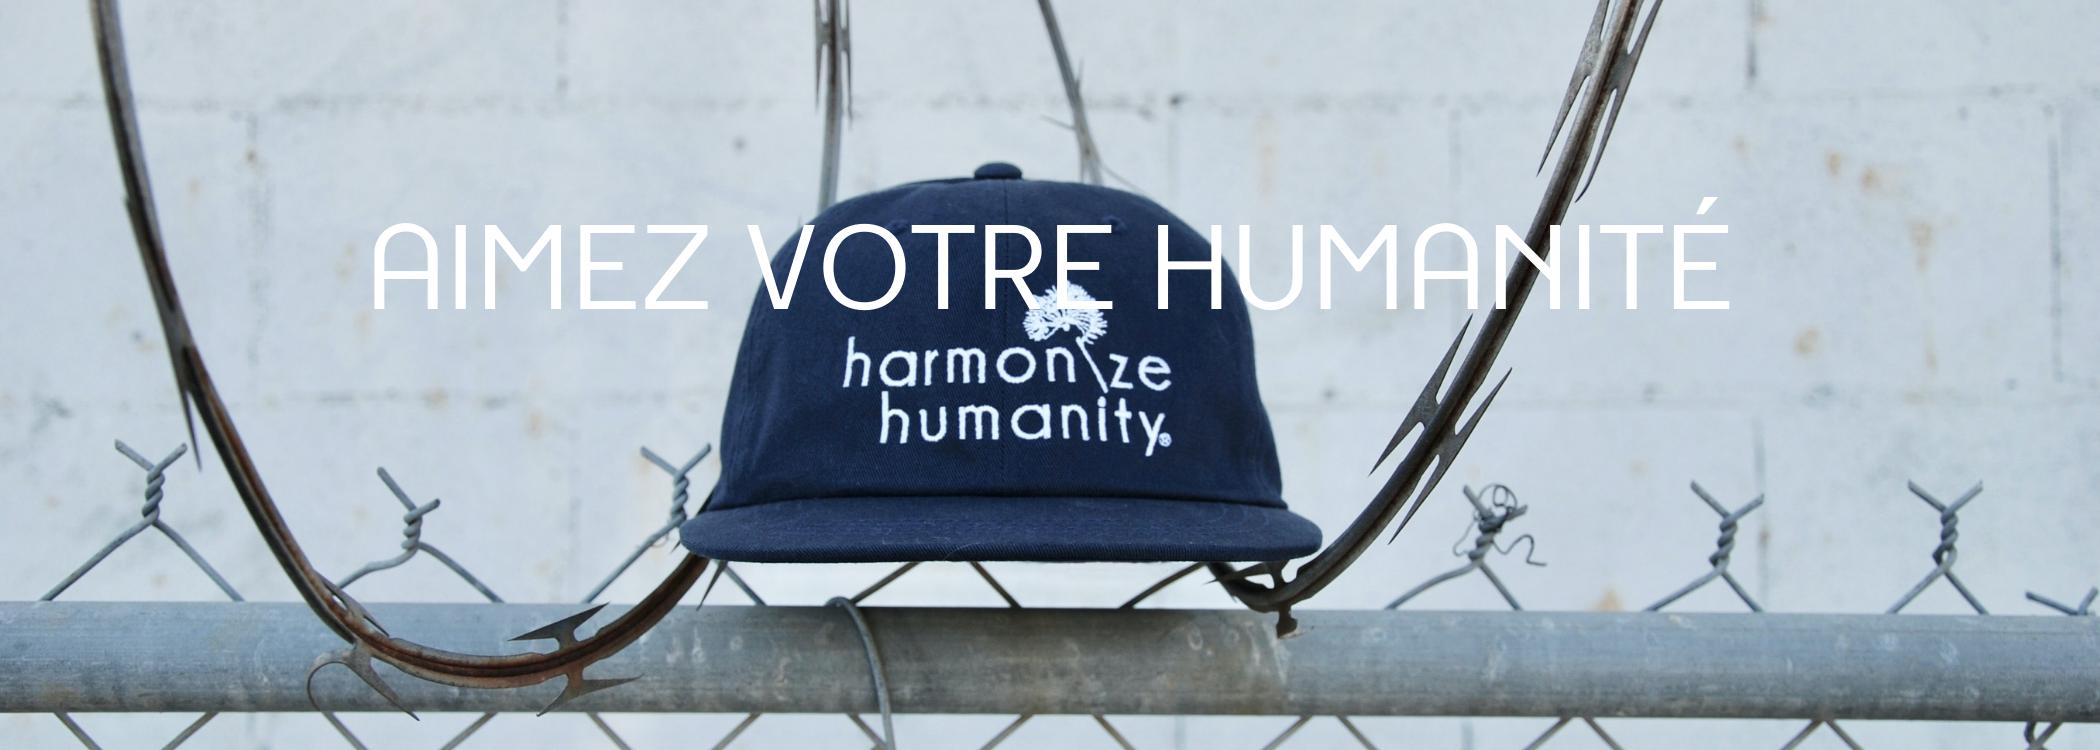 Redevenez humain